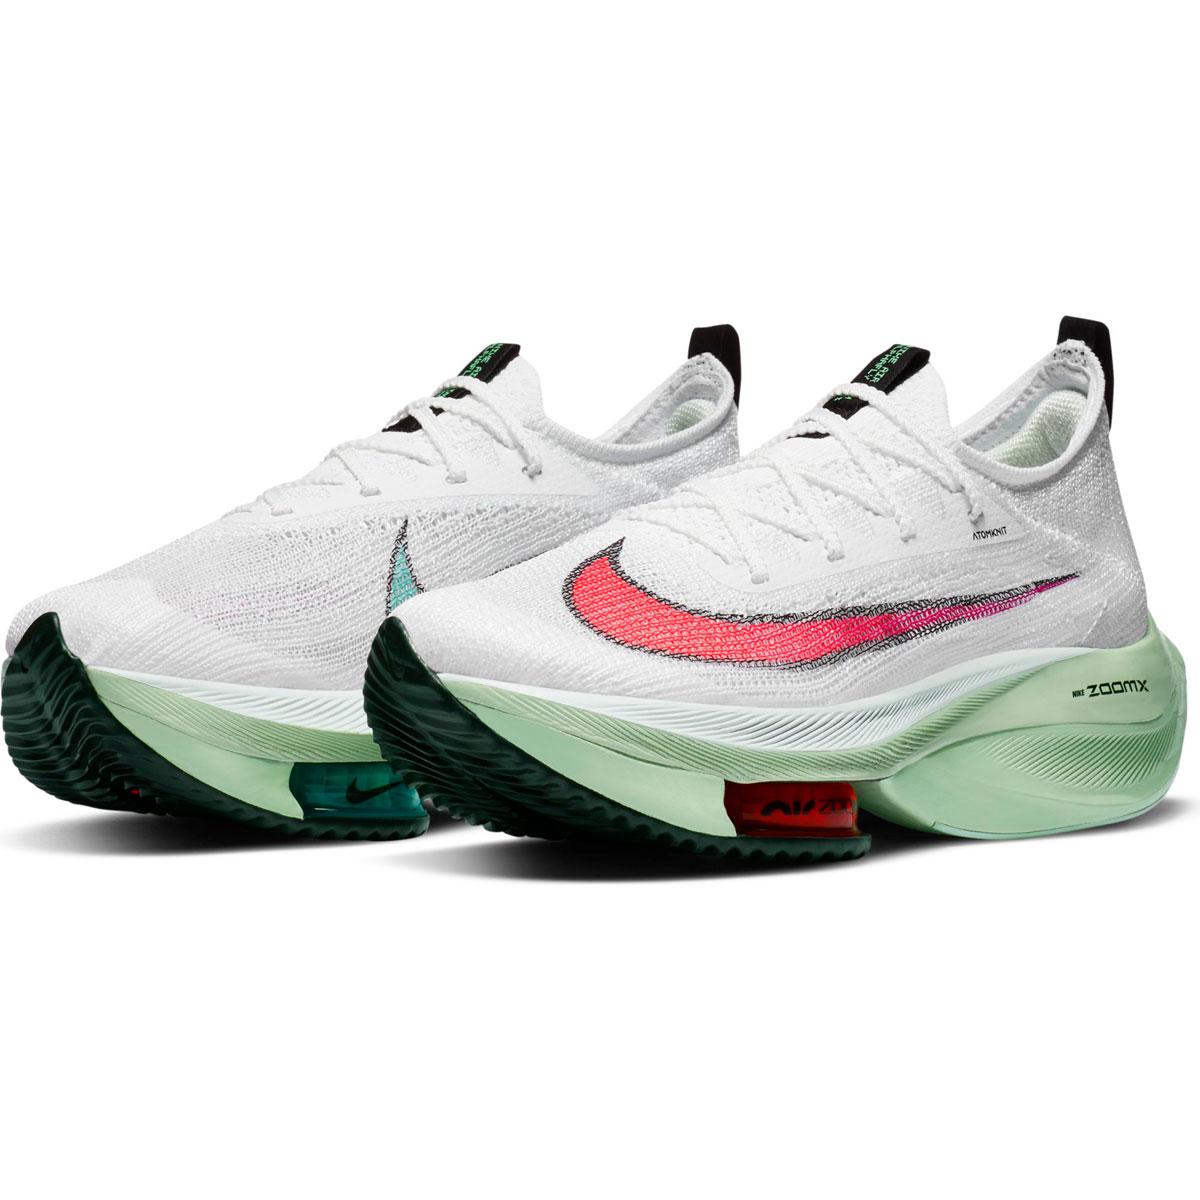 Women's Nike Air Zoom Alphafly Next% Running Shoe - Color: White/Flash Crimson/Jade Aura - Size: 5 - Width: Regular, White/Flash Crimson/Jade Aura, large, image 3